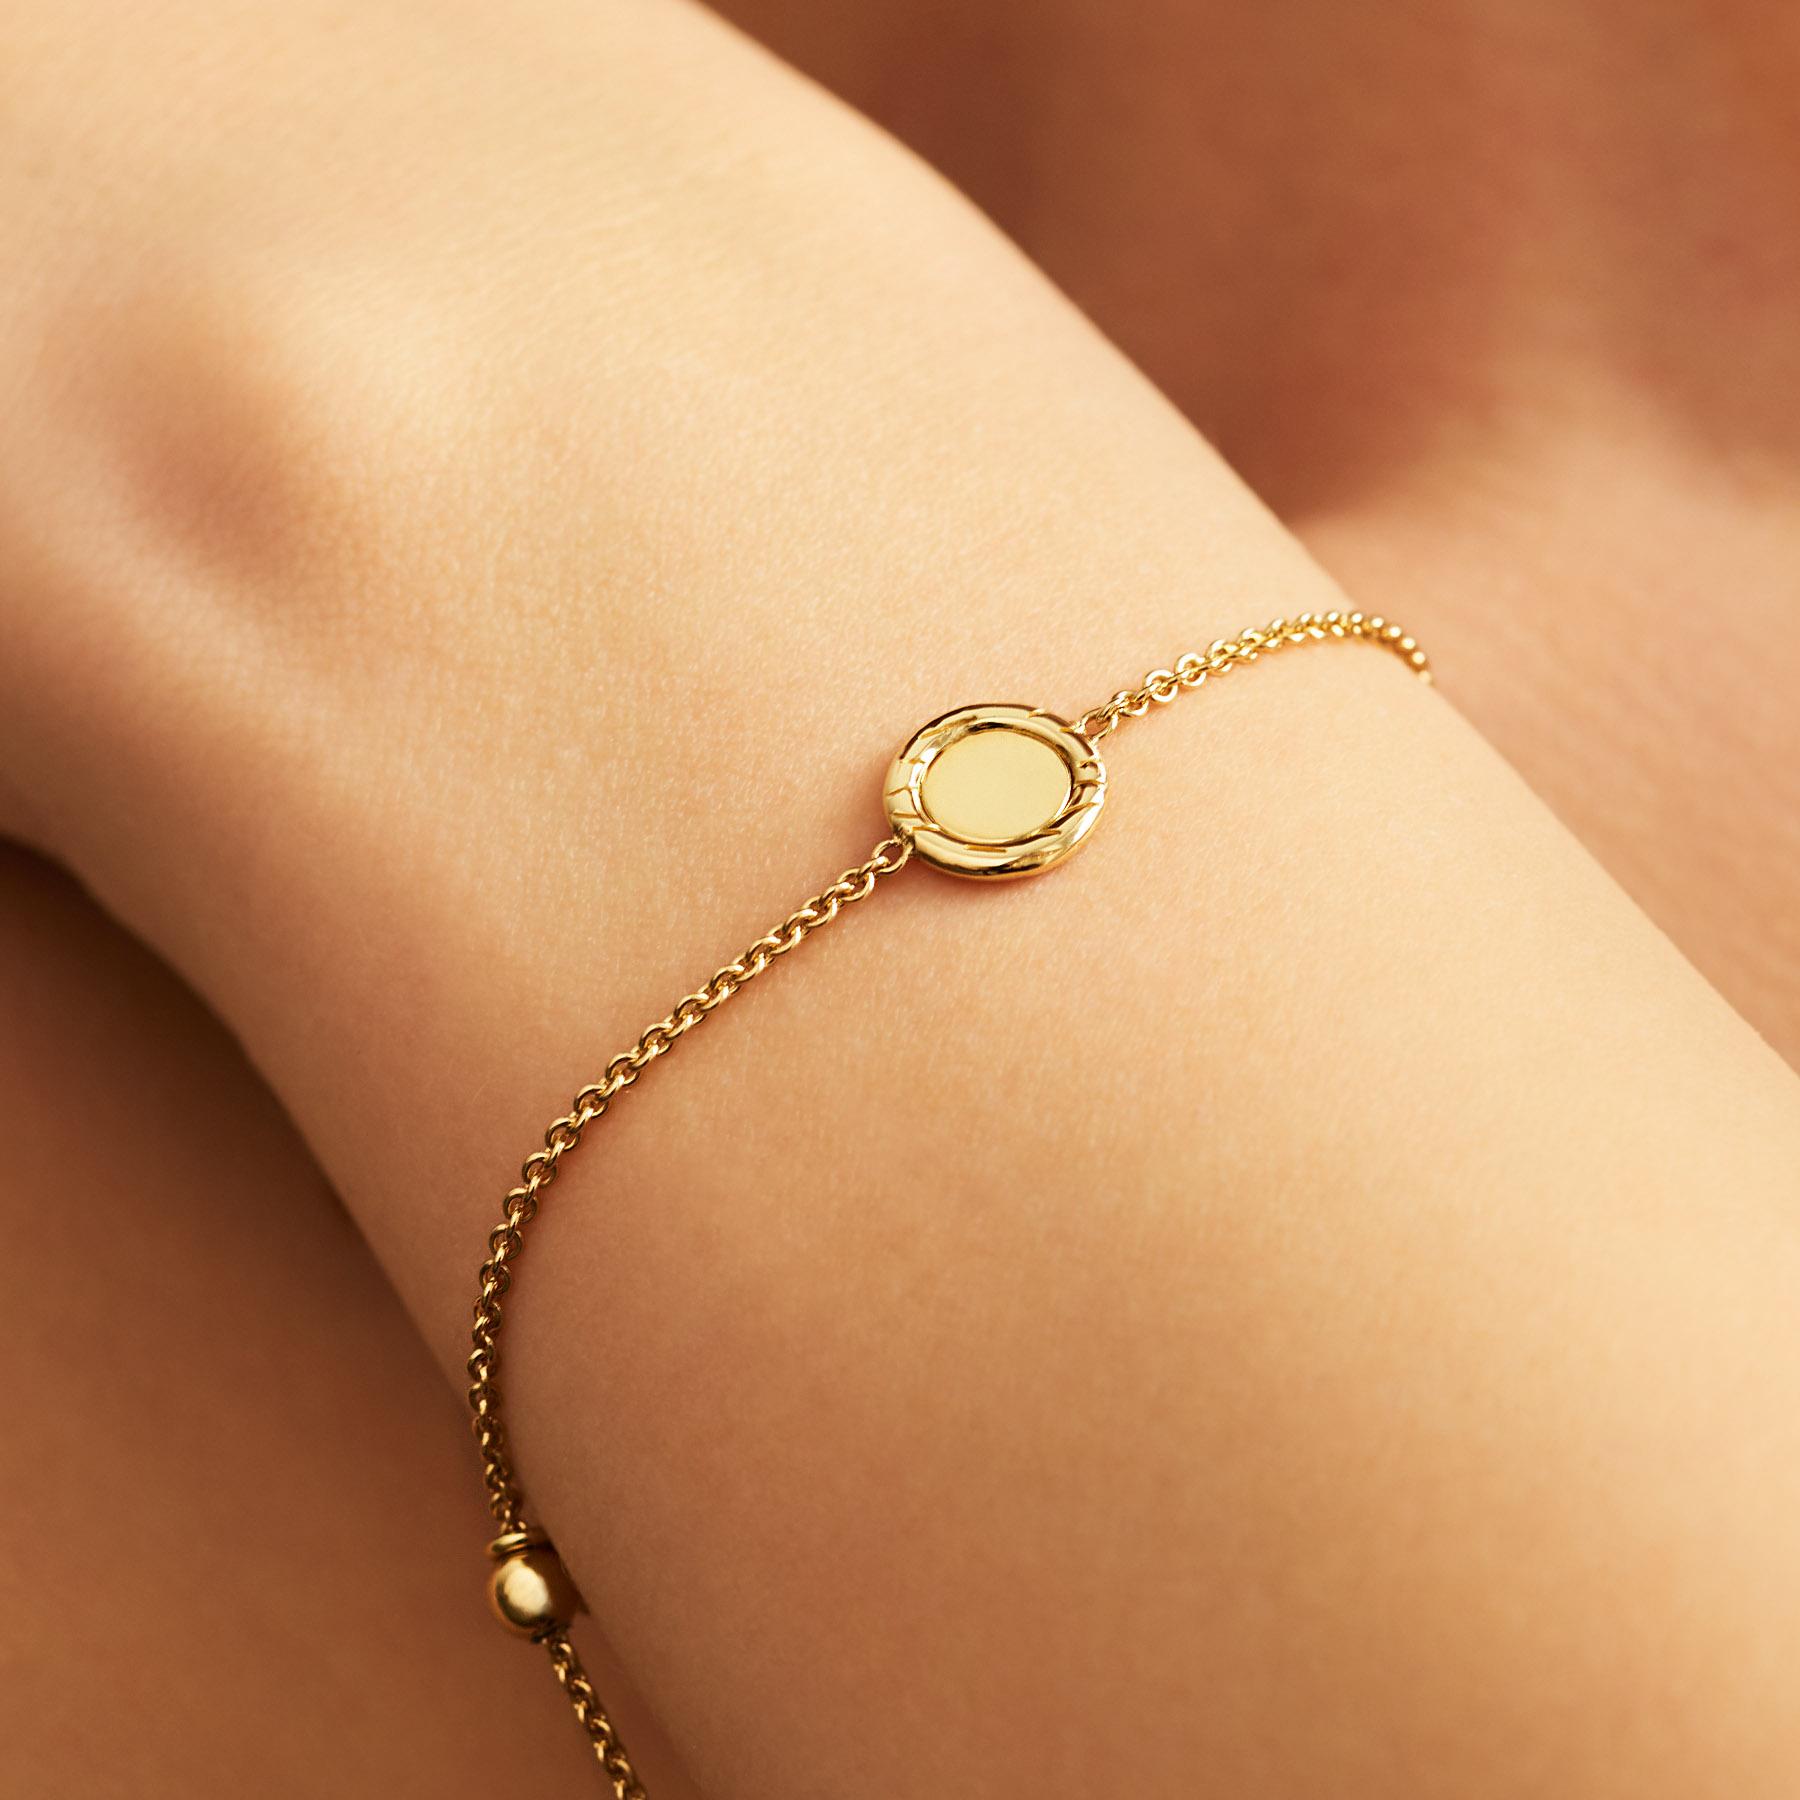 closed-circle-fur-bracelet-FC11A-wrist.jpg